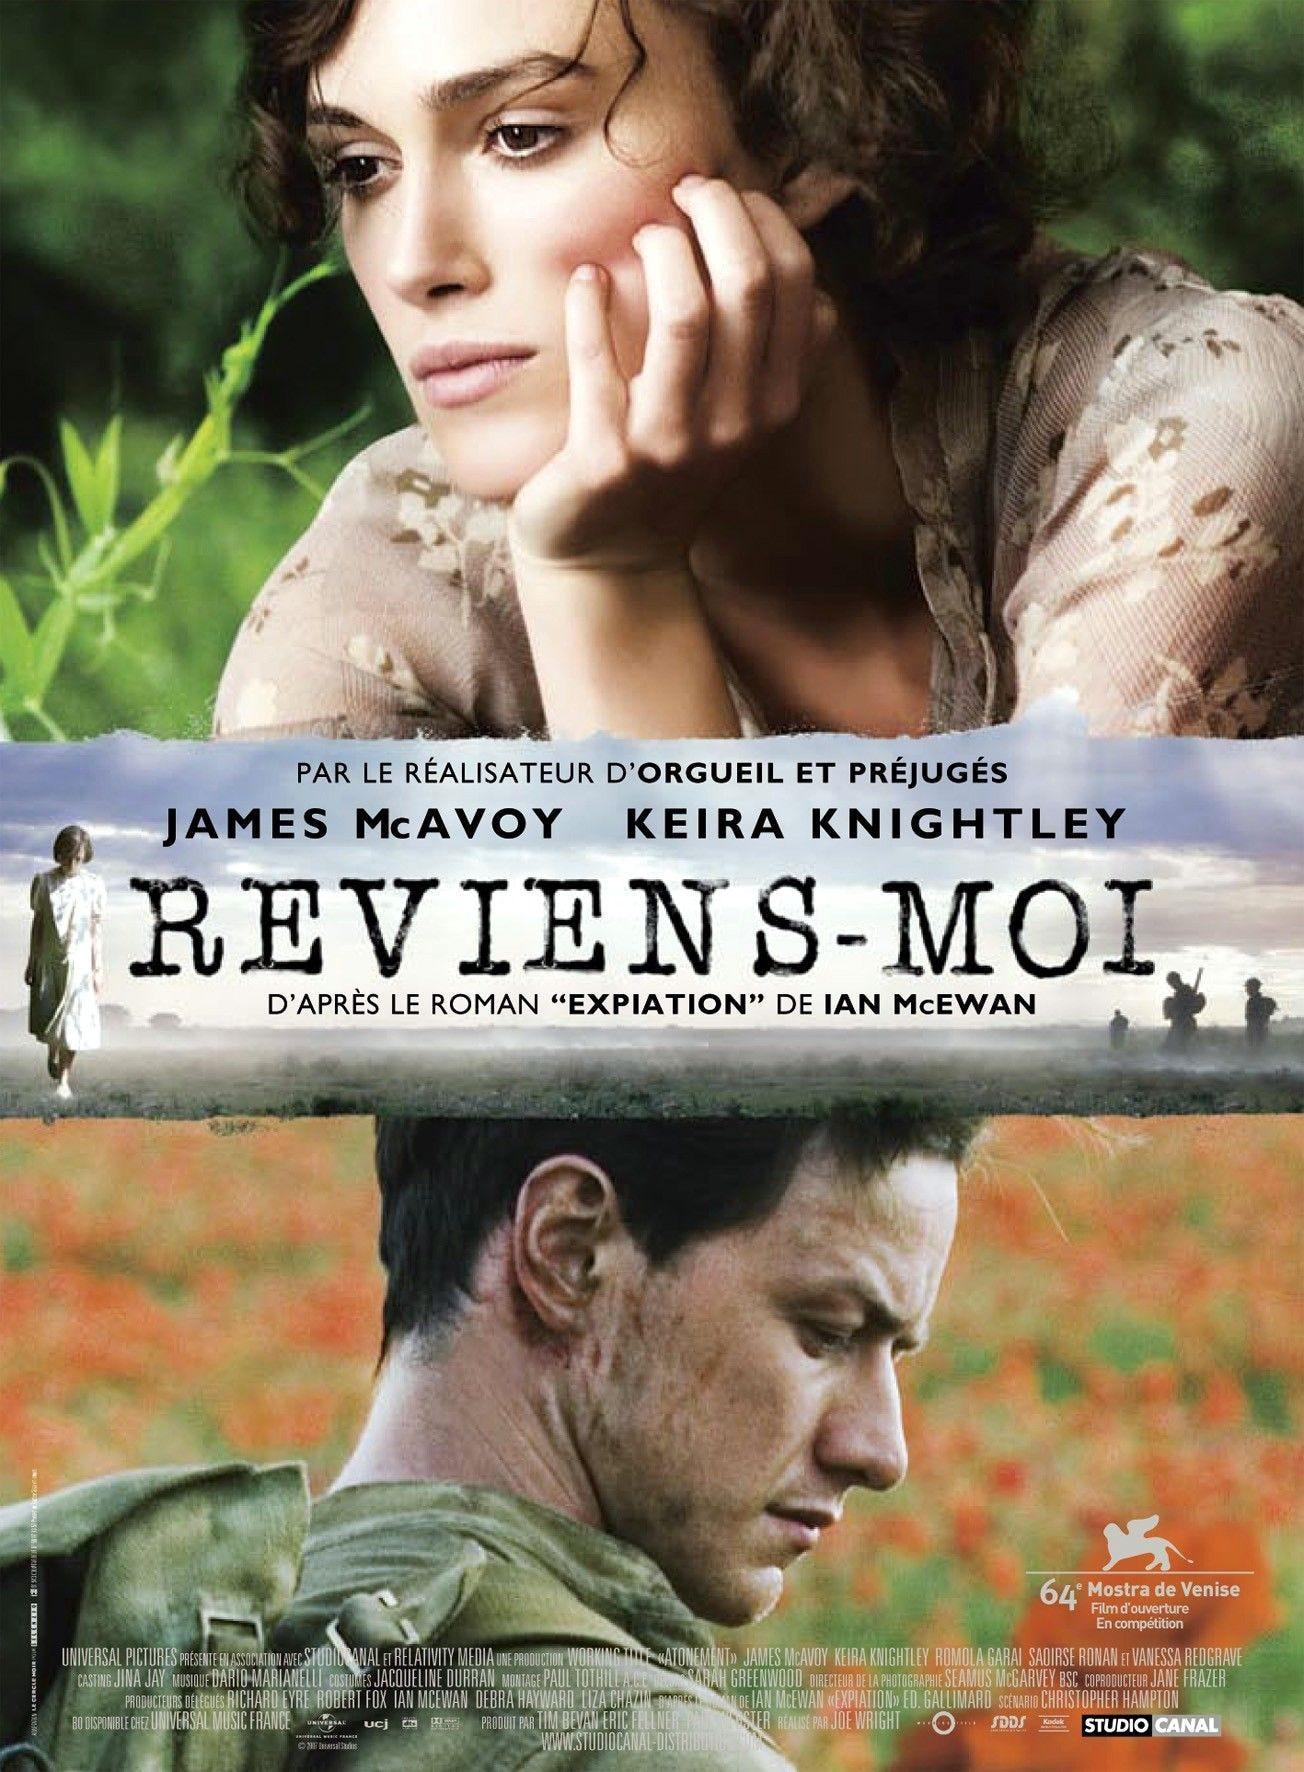 Fallen Film Complet Vf Youtube : fallen, complet, youtube, HD」, Reviens-moi((2007)), Streaming, Complet, Nouveau, Dzinou, Medium